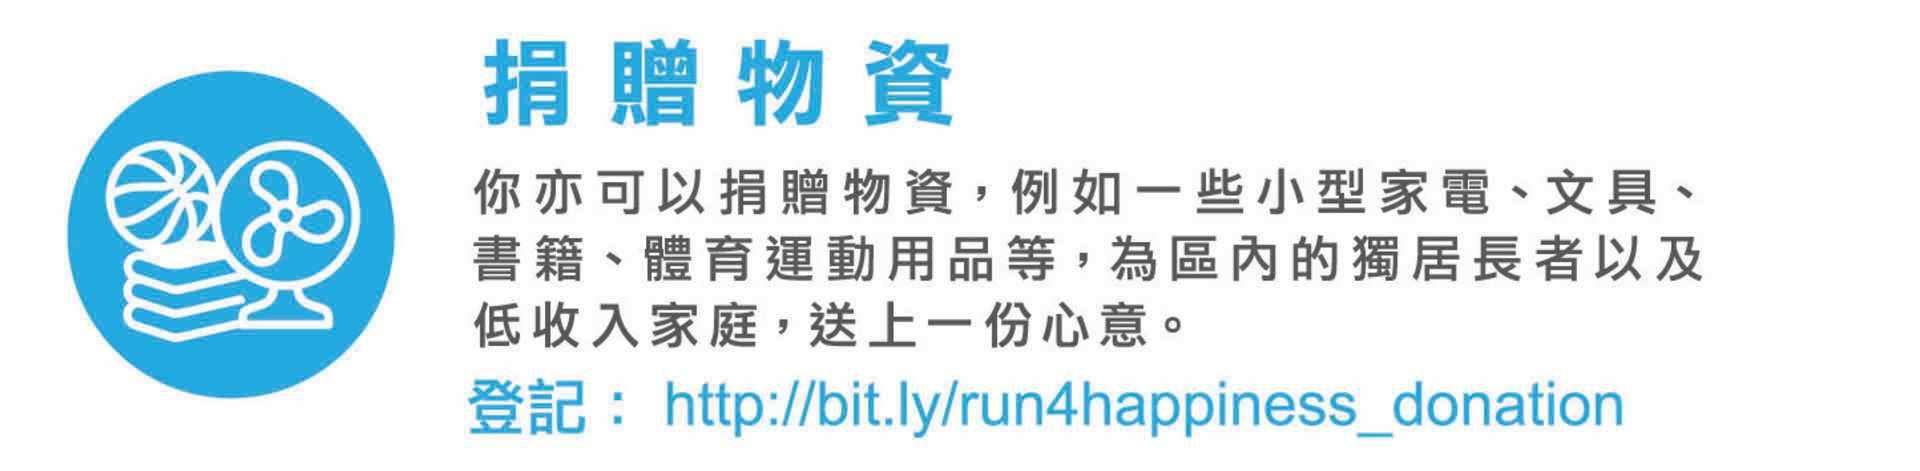 runforhappiness-06